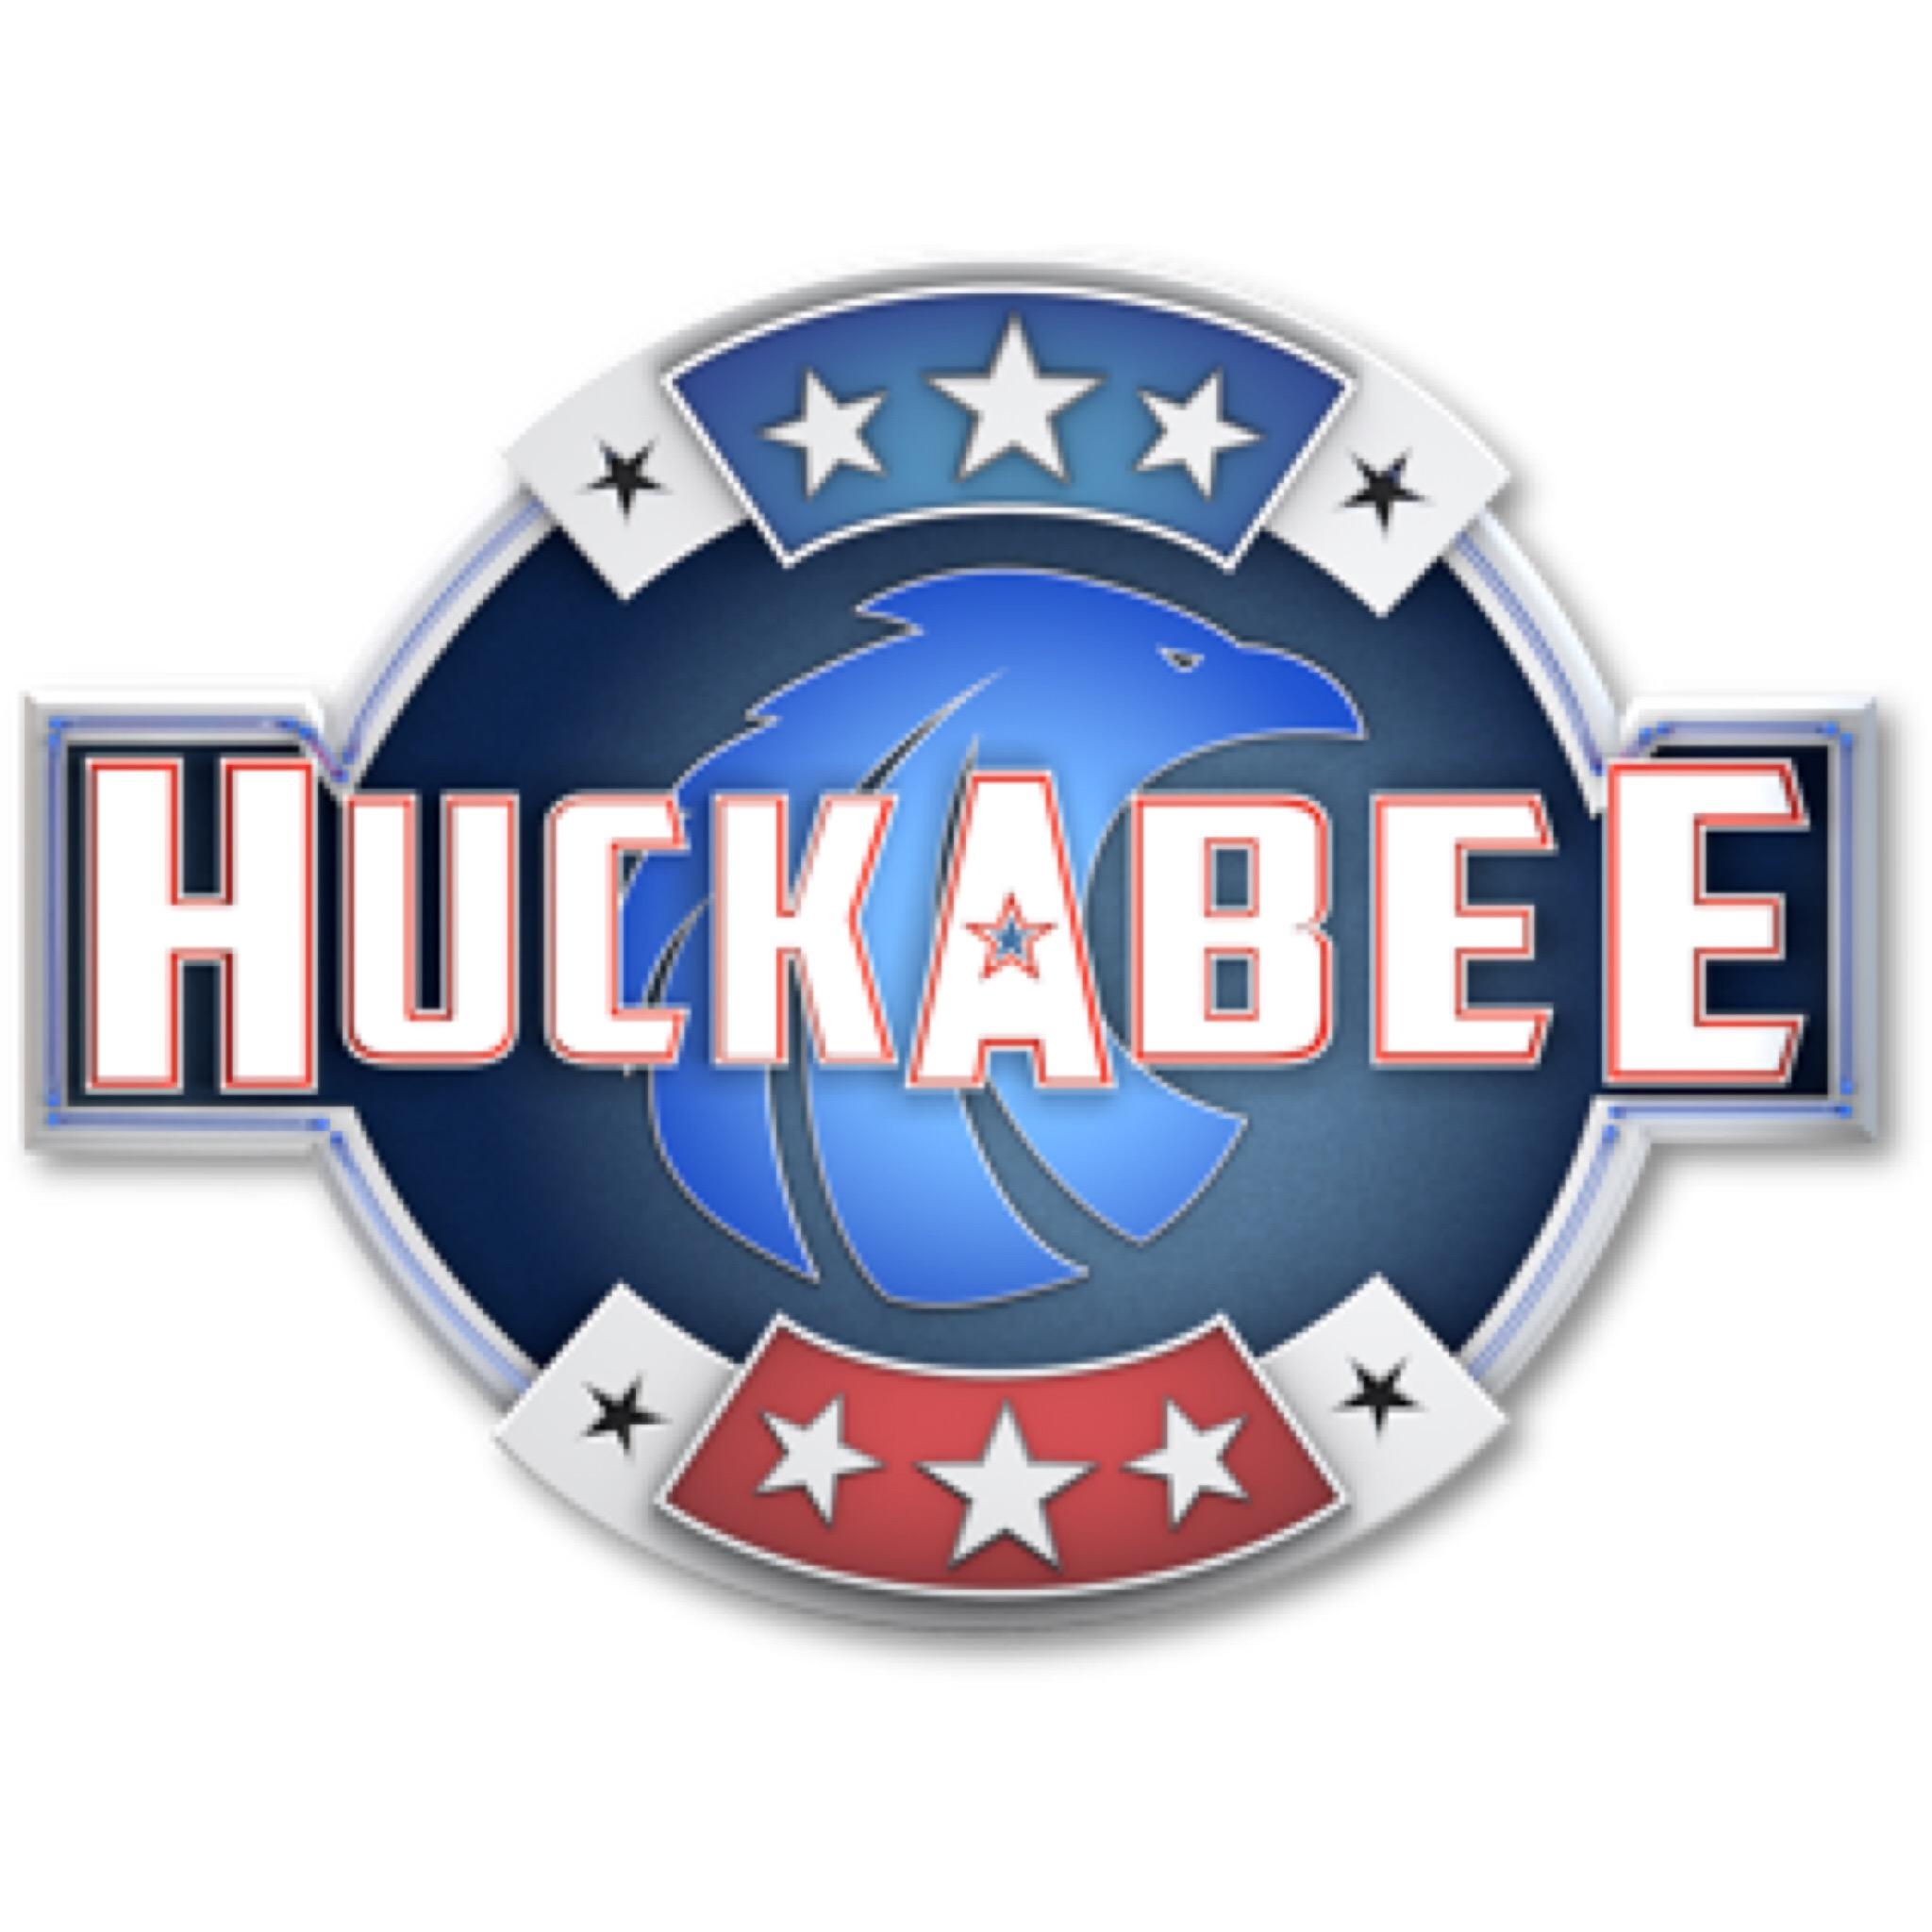 The Huckabee Show - DIGITAL EXCLUSIVE: Stephanie Owens Performs